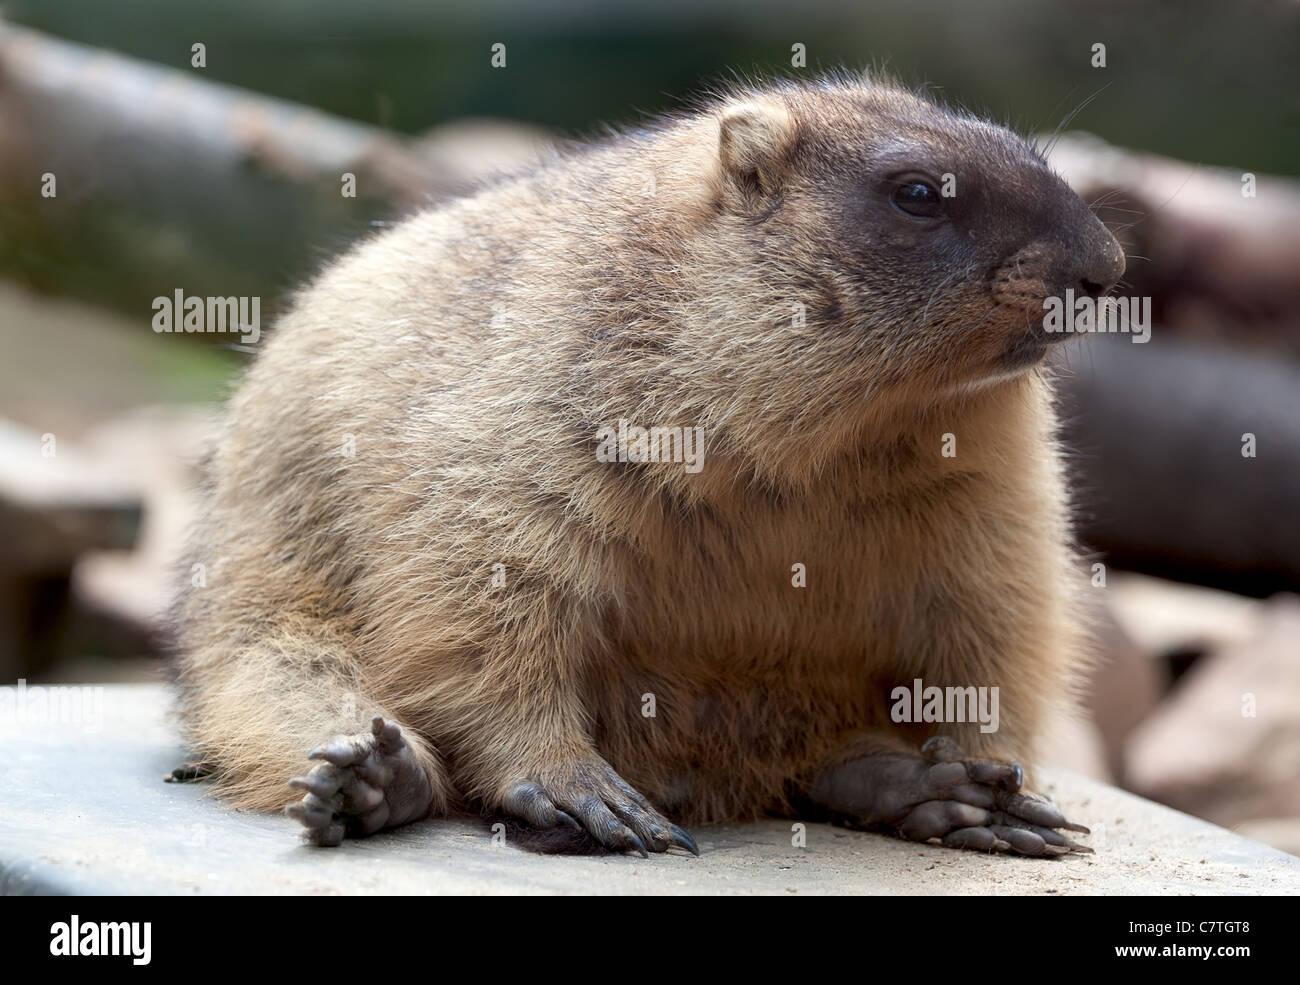 Funny marmot. Marmot seating on the back. Woodchuck - Stock Image